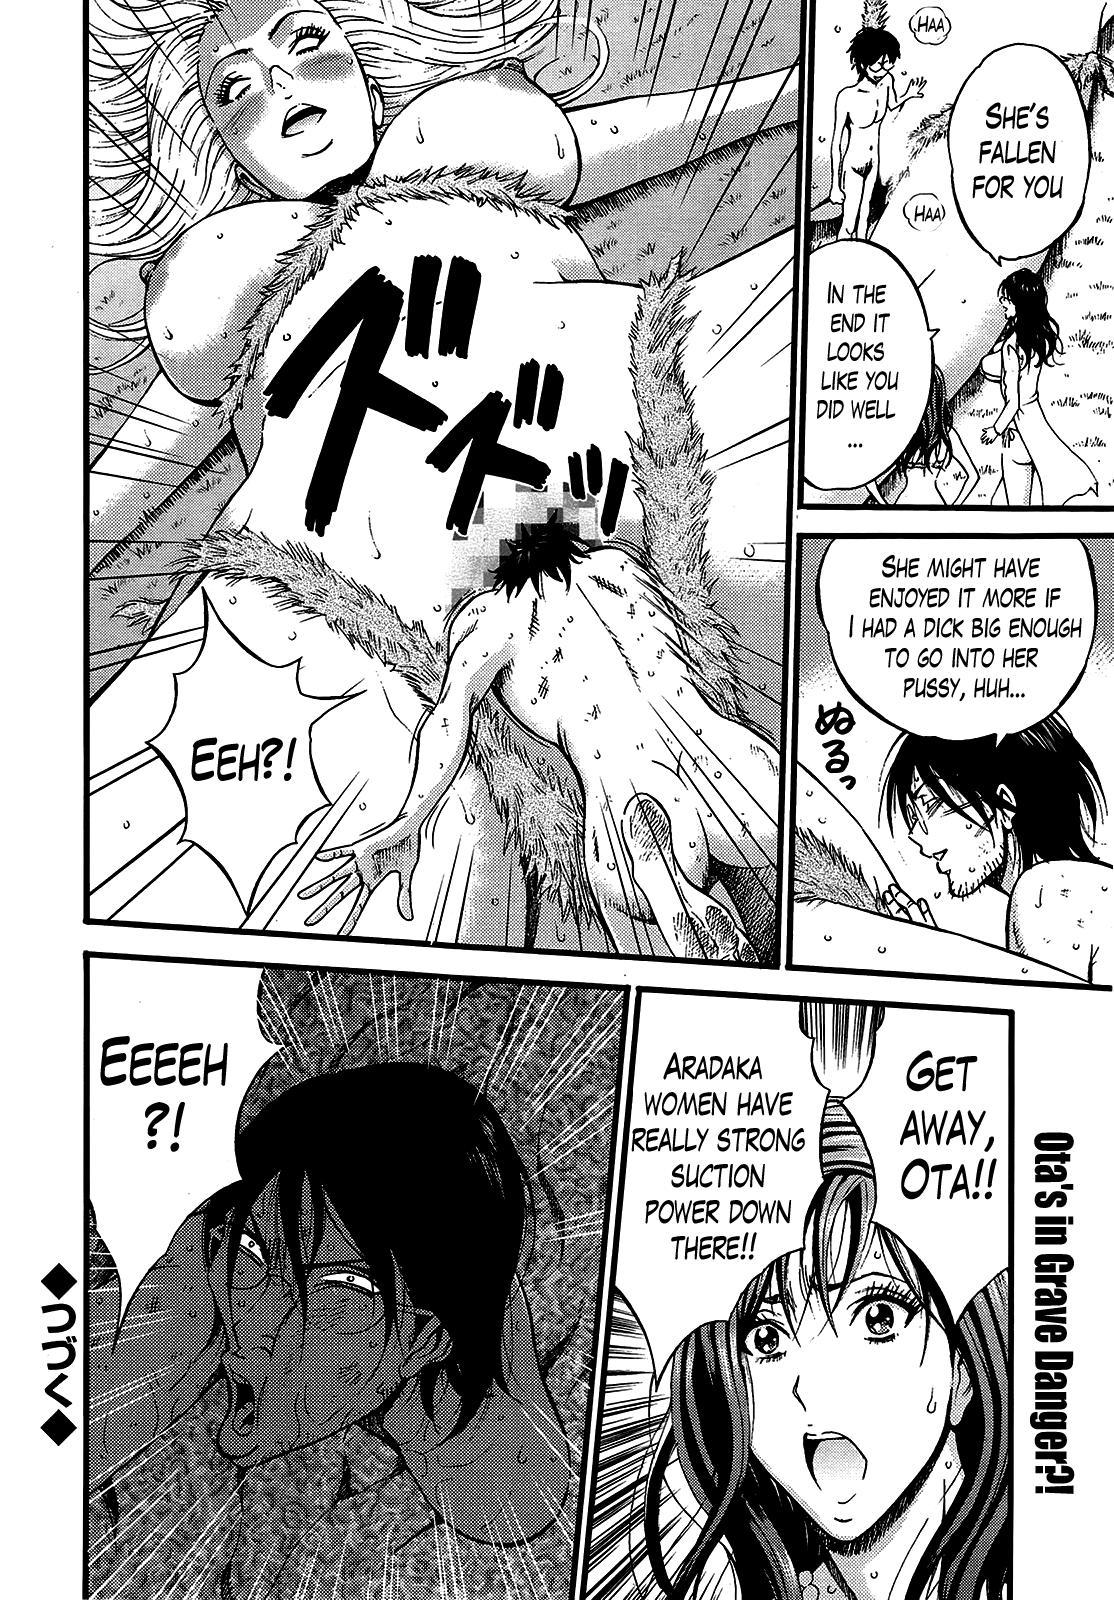 Kigenzen 10000 Nen no Ota | The Otaku in 10,000 B.C. 326